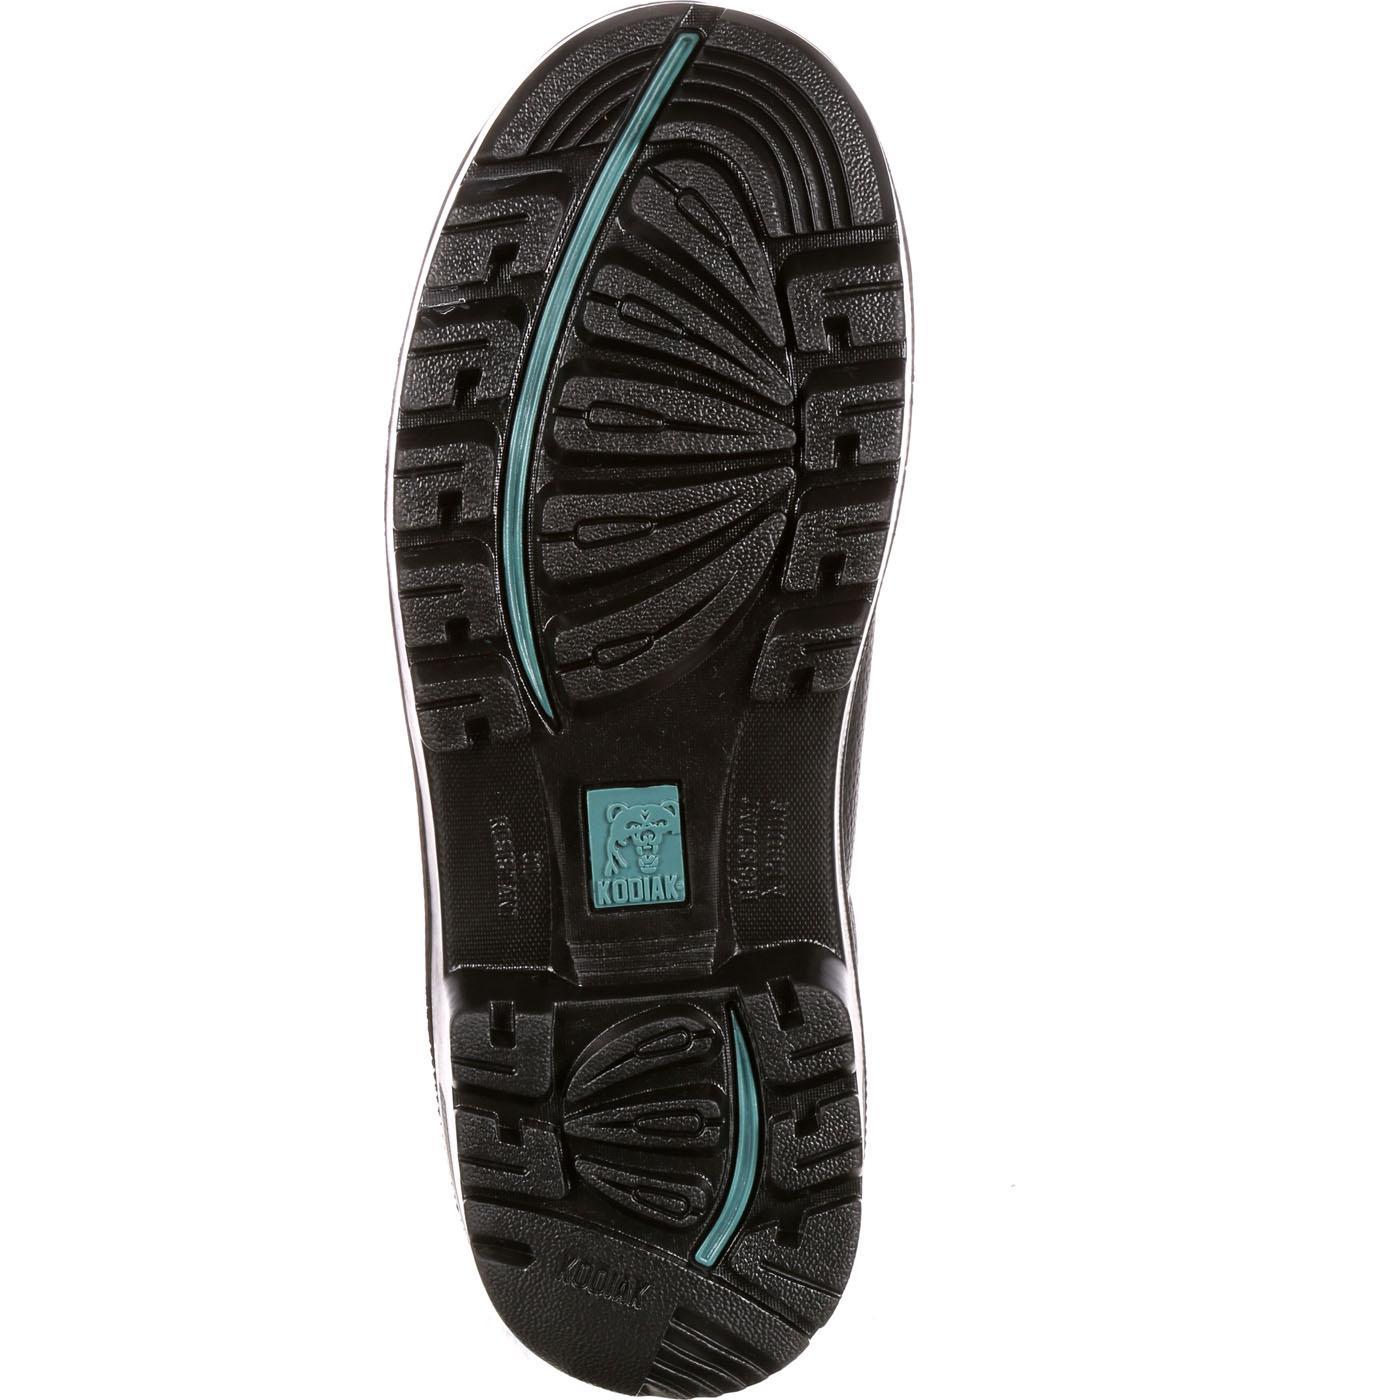 c26bd4249ff Kodiak Blue CSA-Approved Aluminum Toe Puncture-Resistant Work Boot